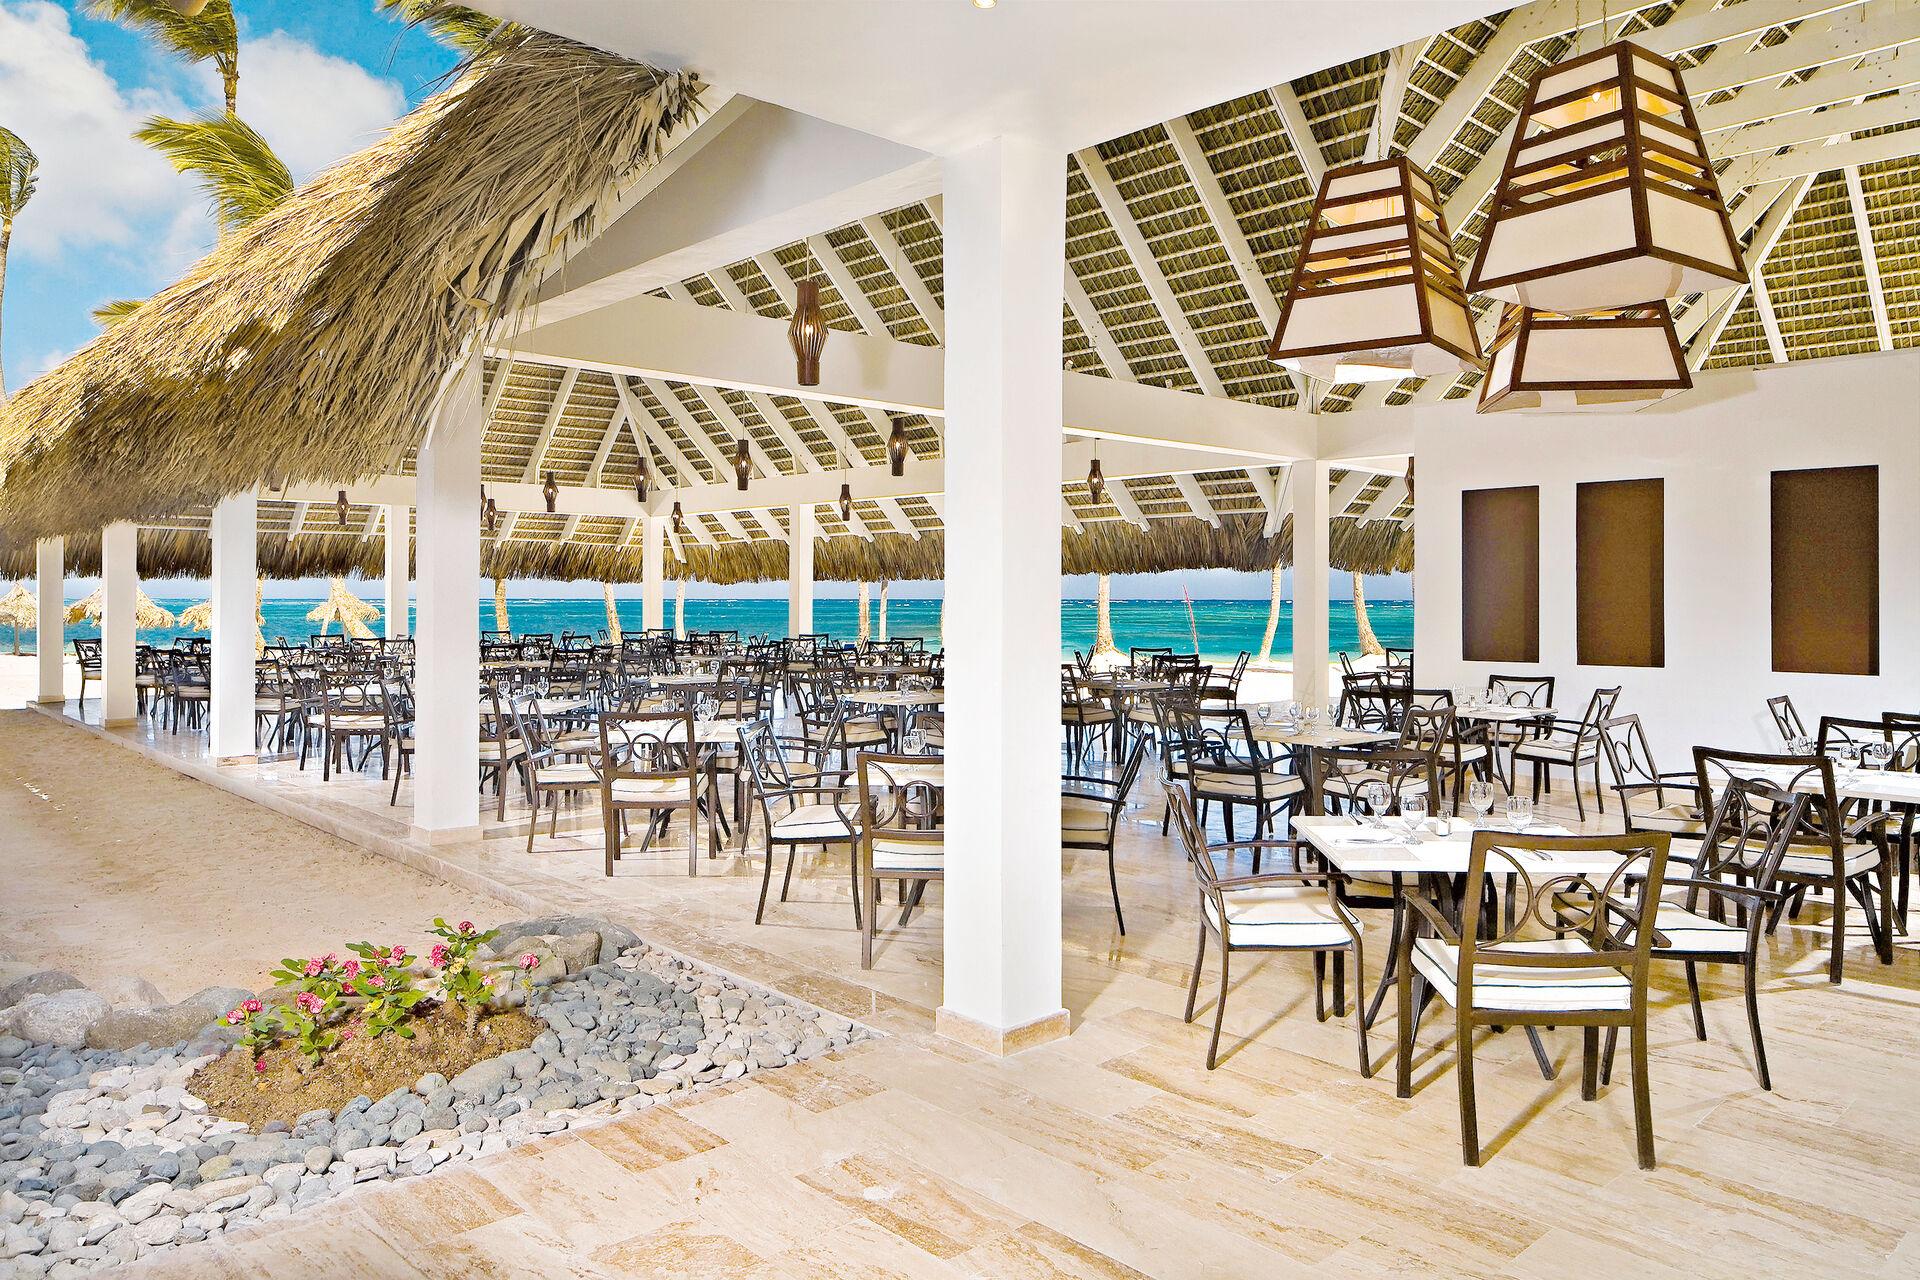 Melia Punta Cana Beach - A Wellness Inclusive Resort (- Adults Only) - 5*